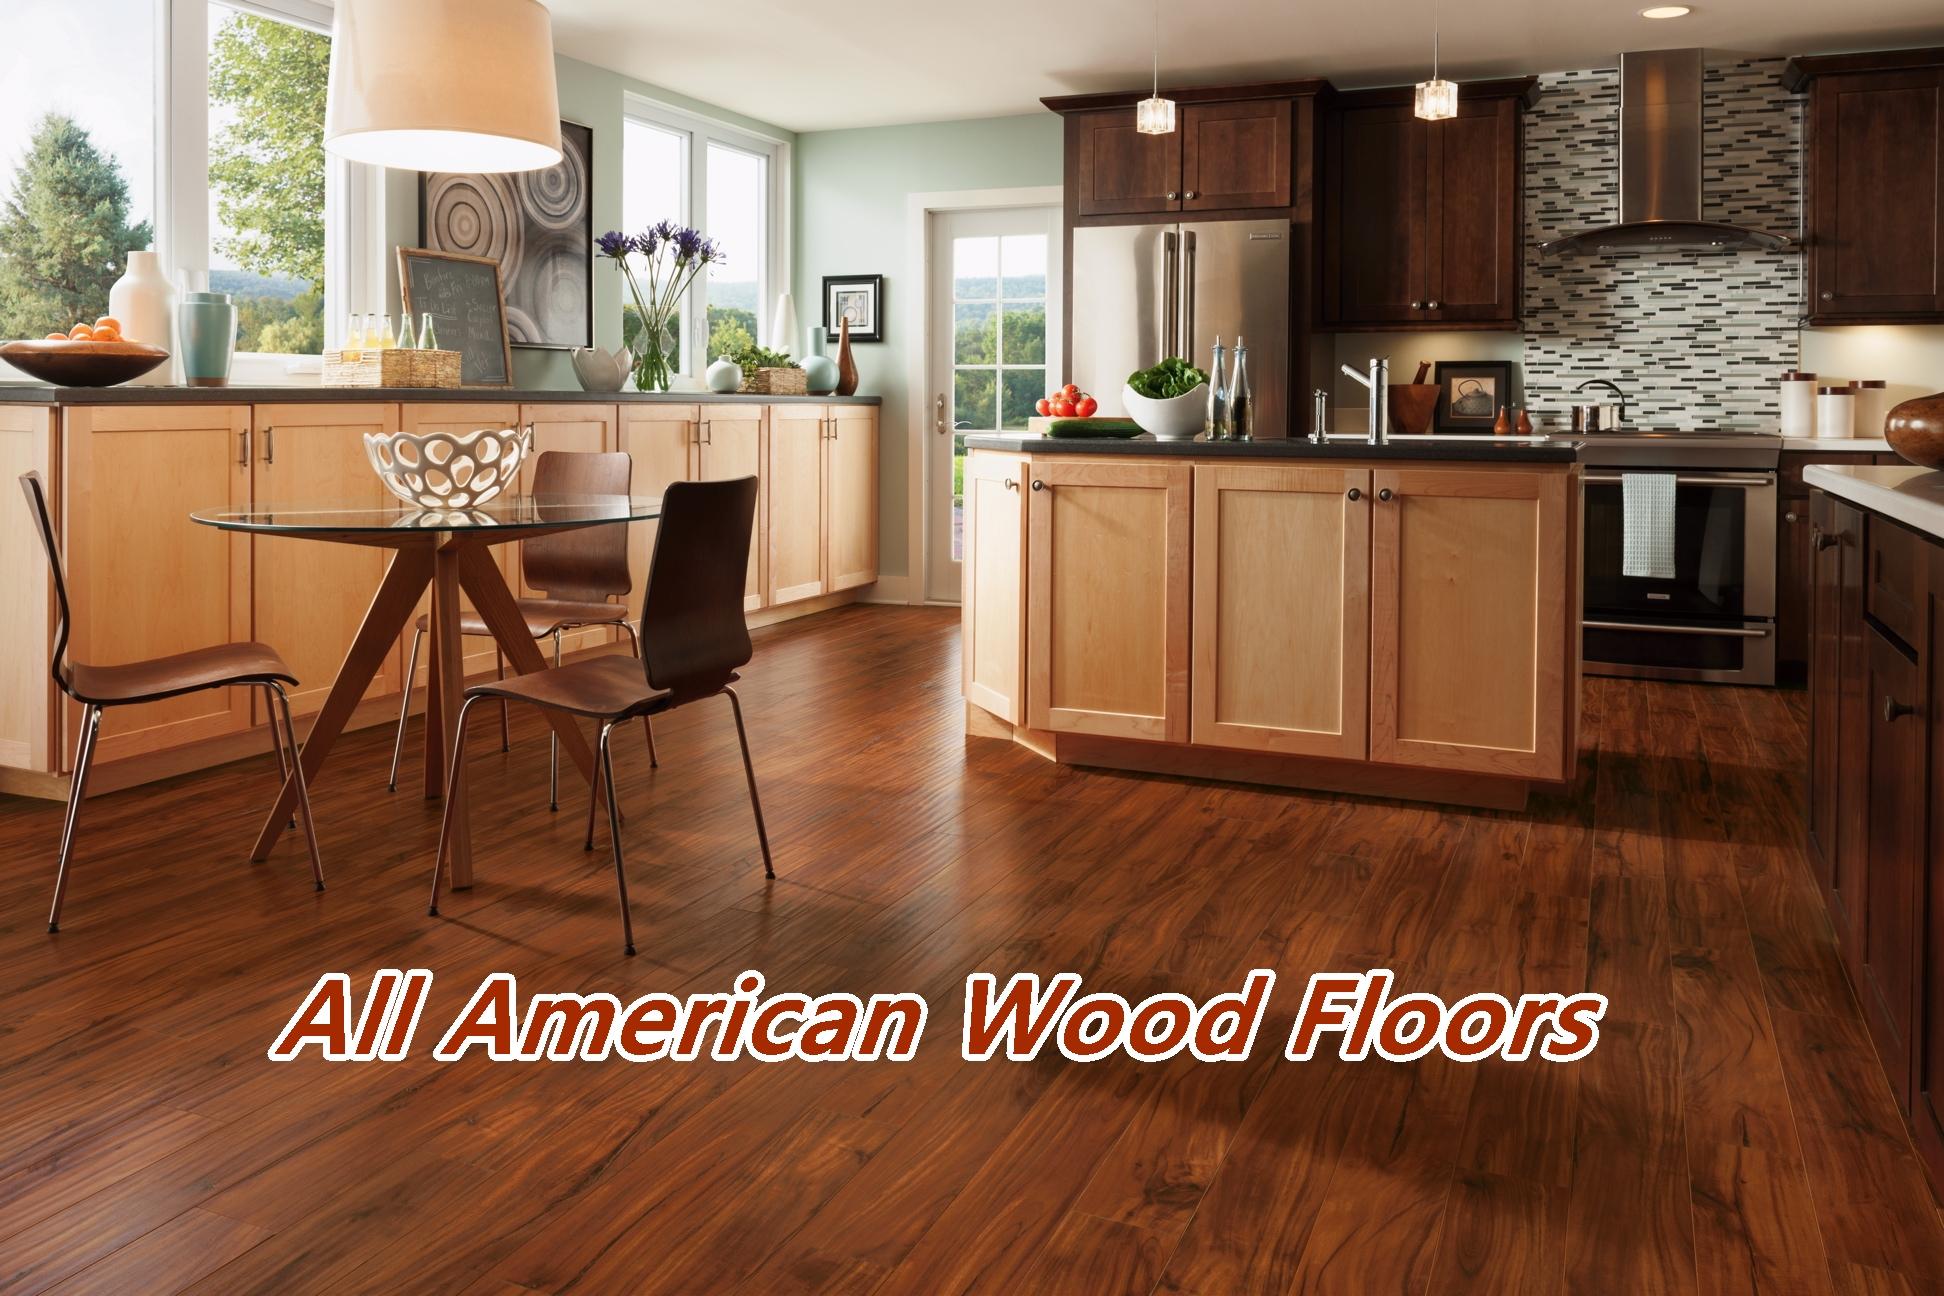 allamerican woodfloors wood floors in kitchen